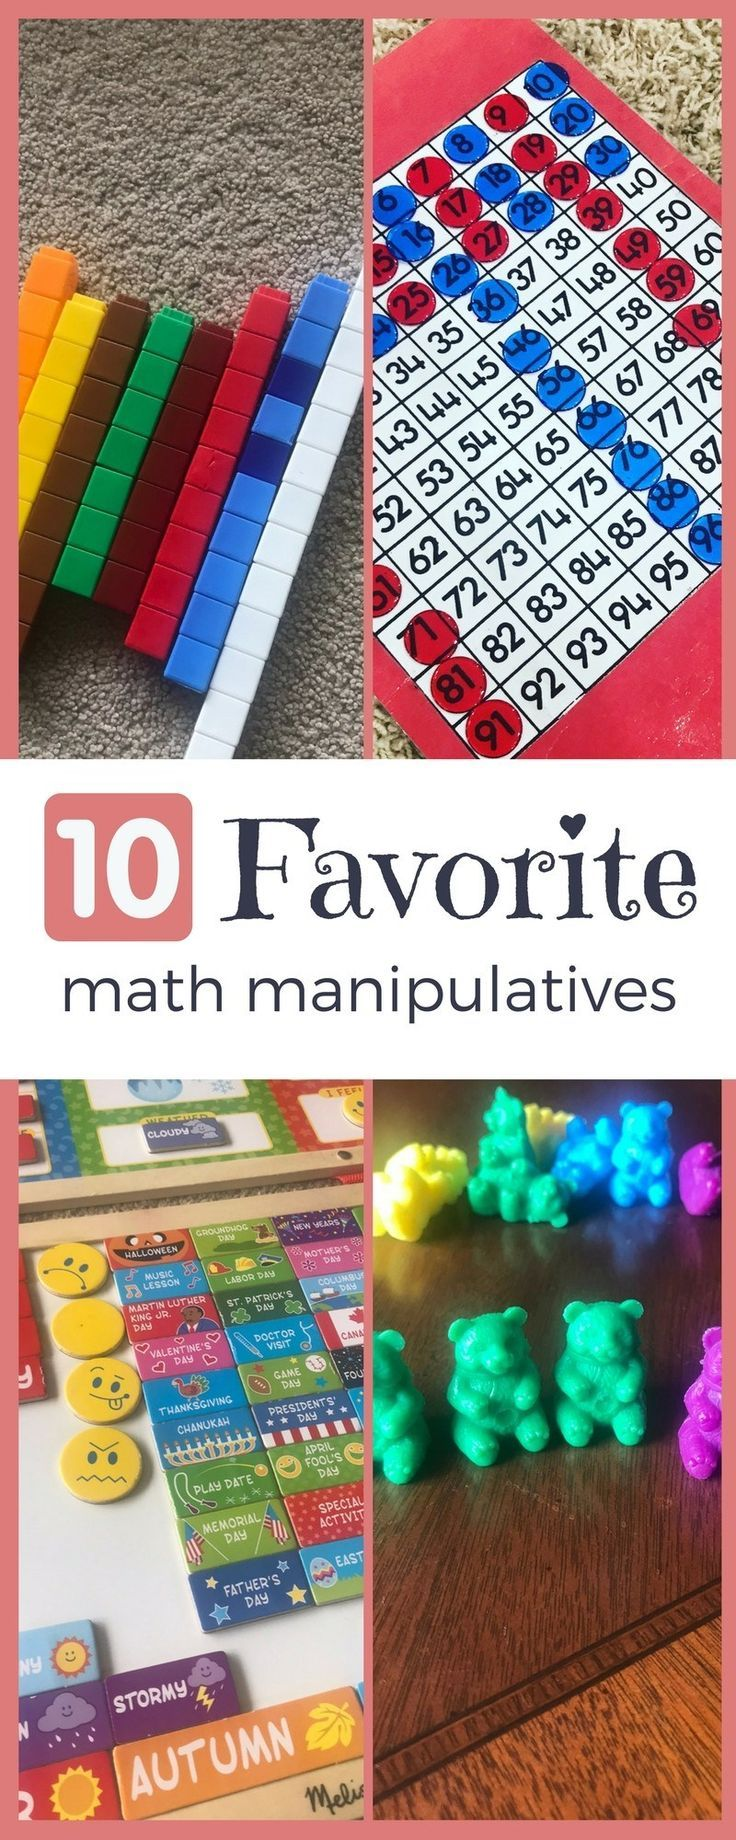 top 10 favorite math manipulatives math for second grade math manipulatives preschool math. Black Bedroom Furniture Sets. Home Design Ideas